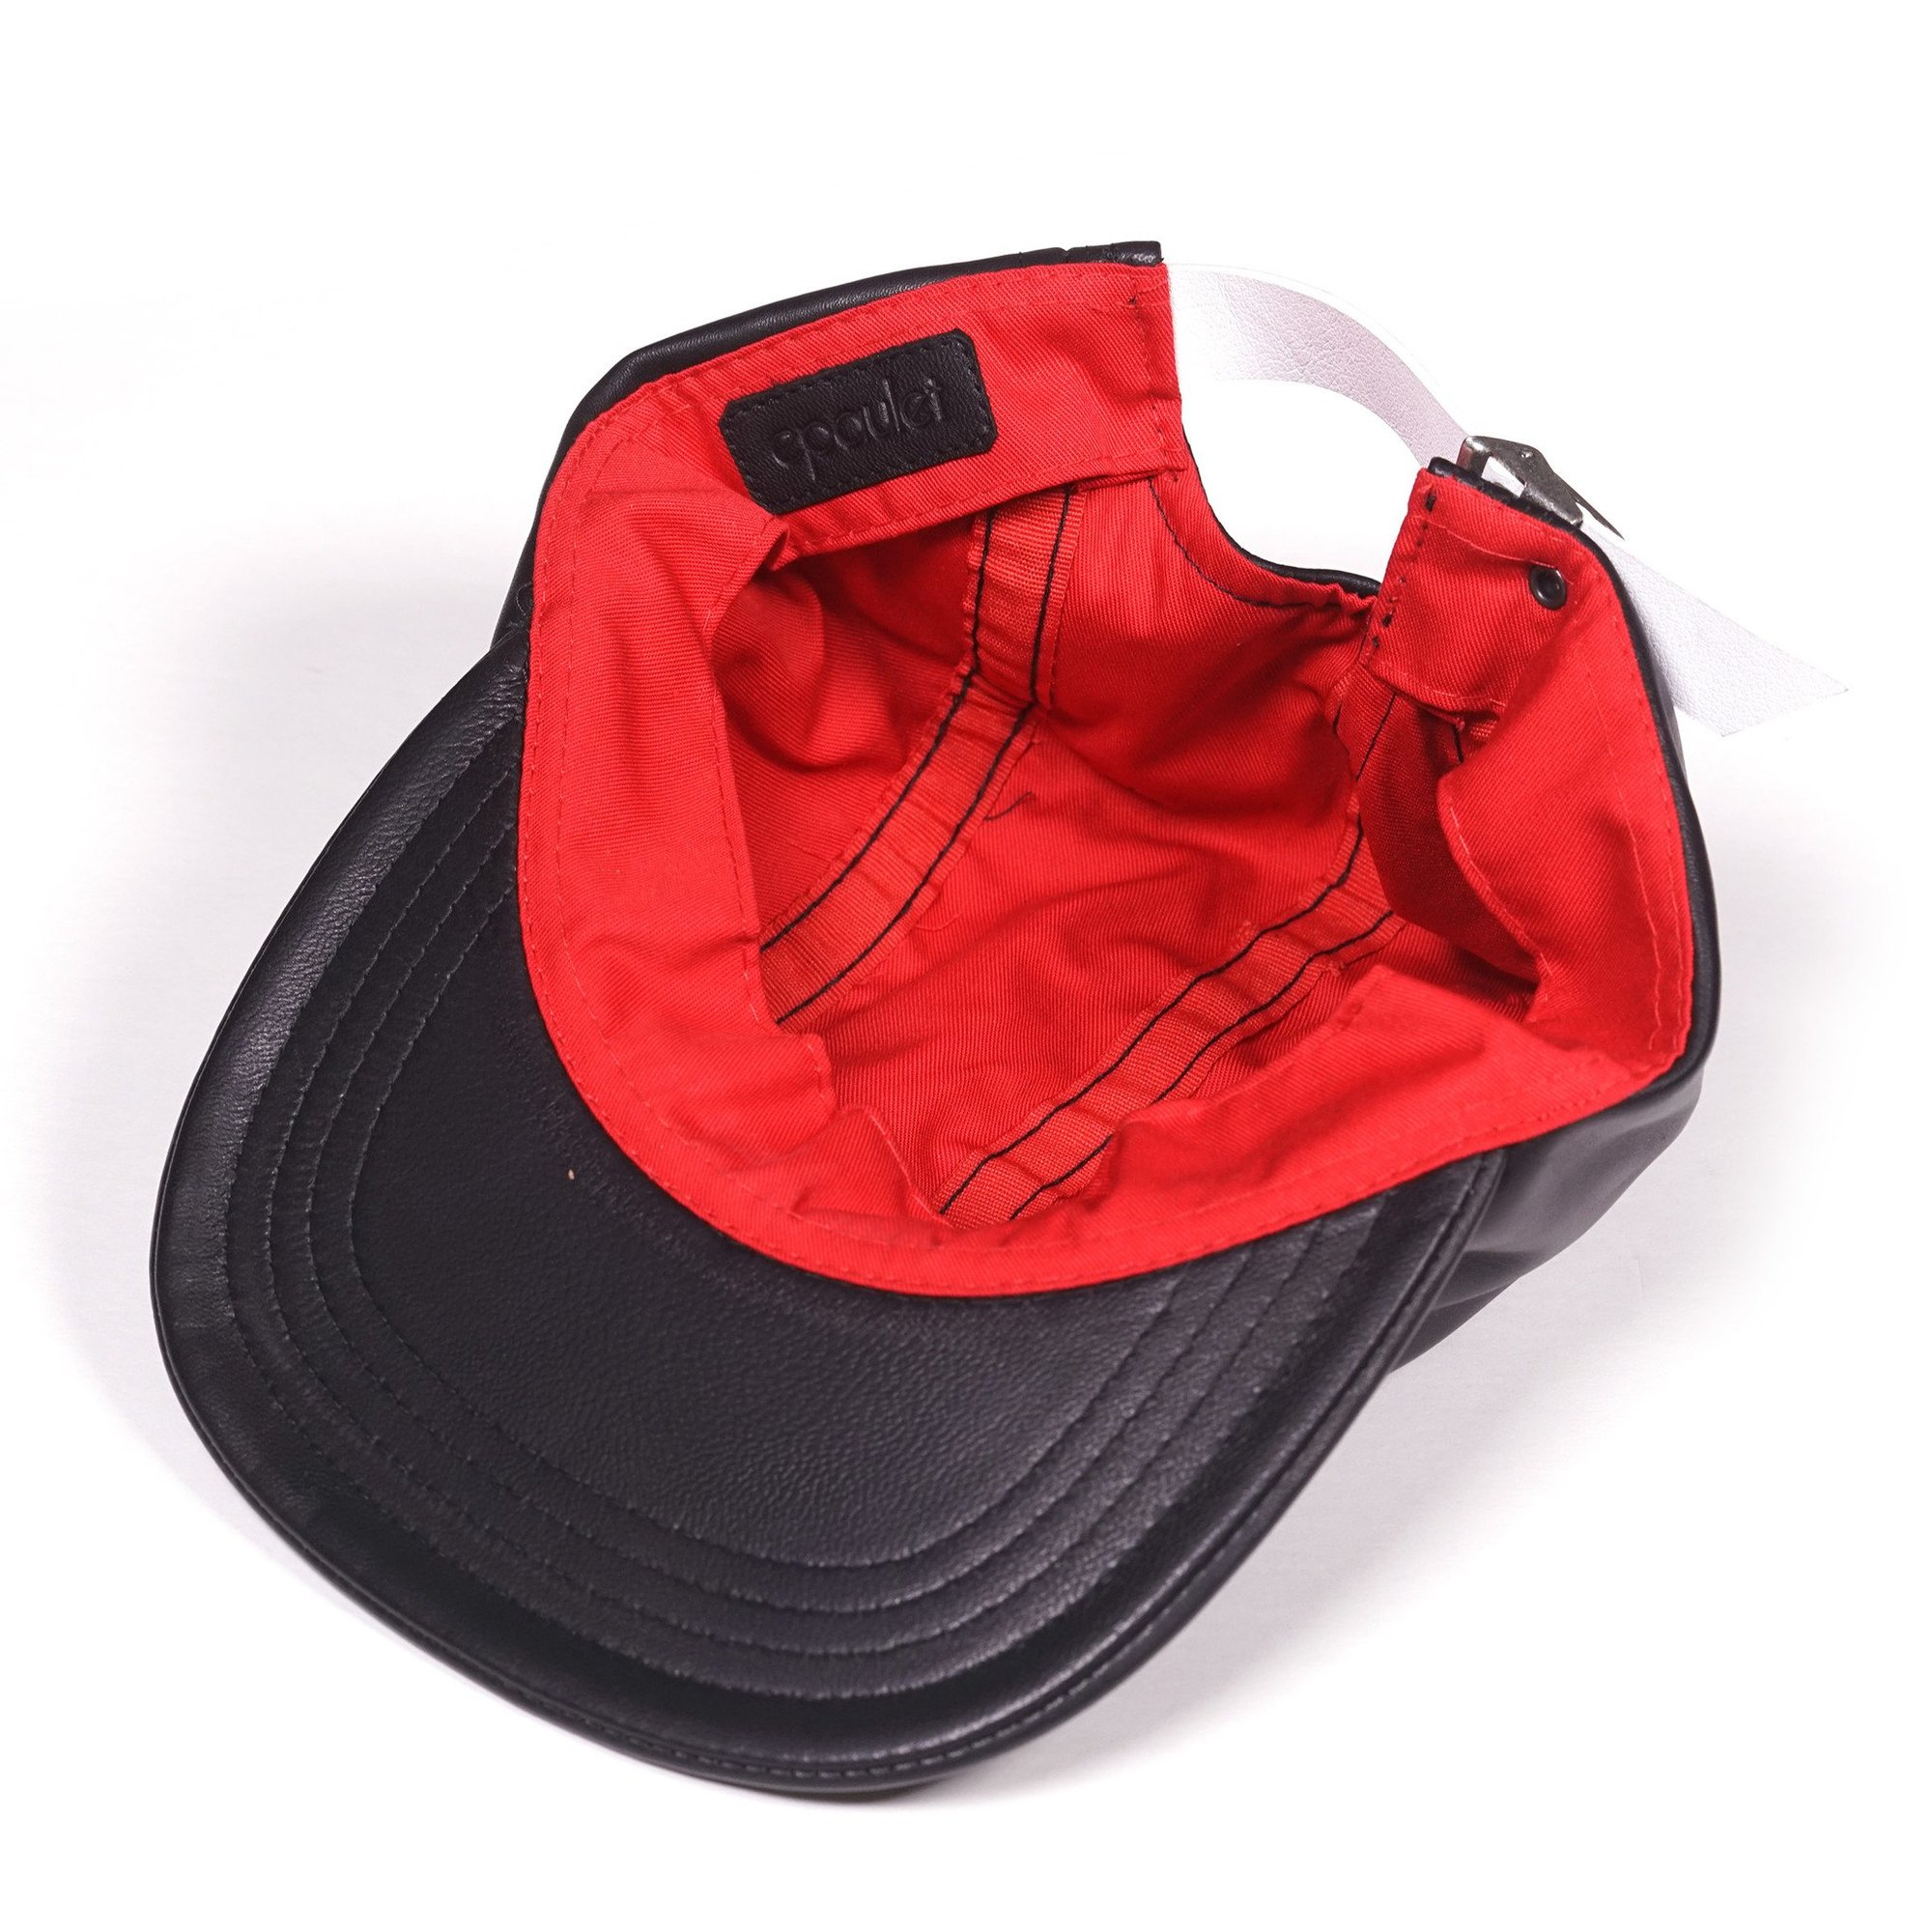 epaulet cap black leather 3.jpg